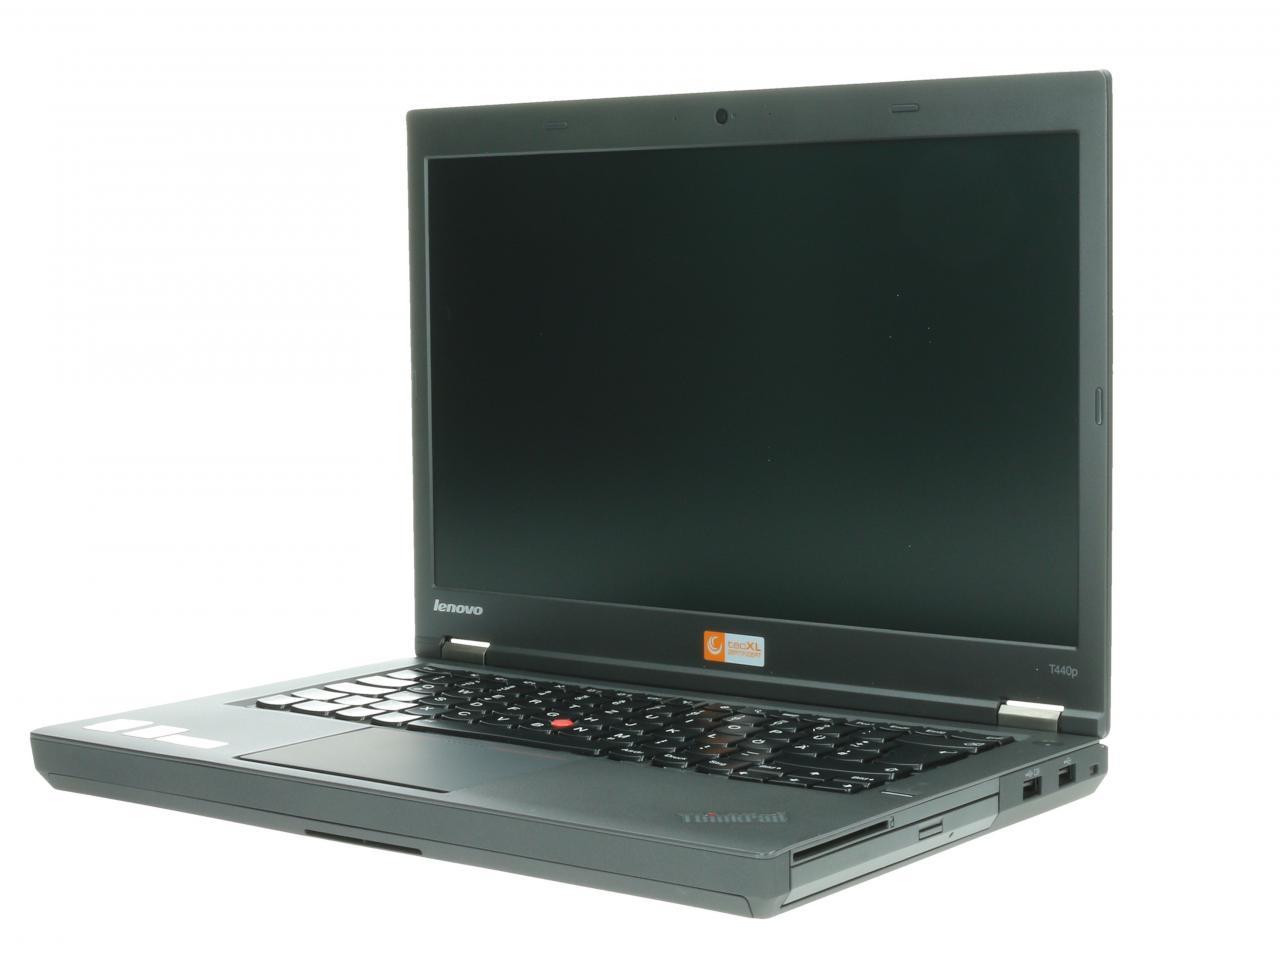 Lenovo ThinkPad T440p  - shop.bb-net.de